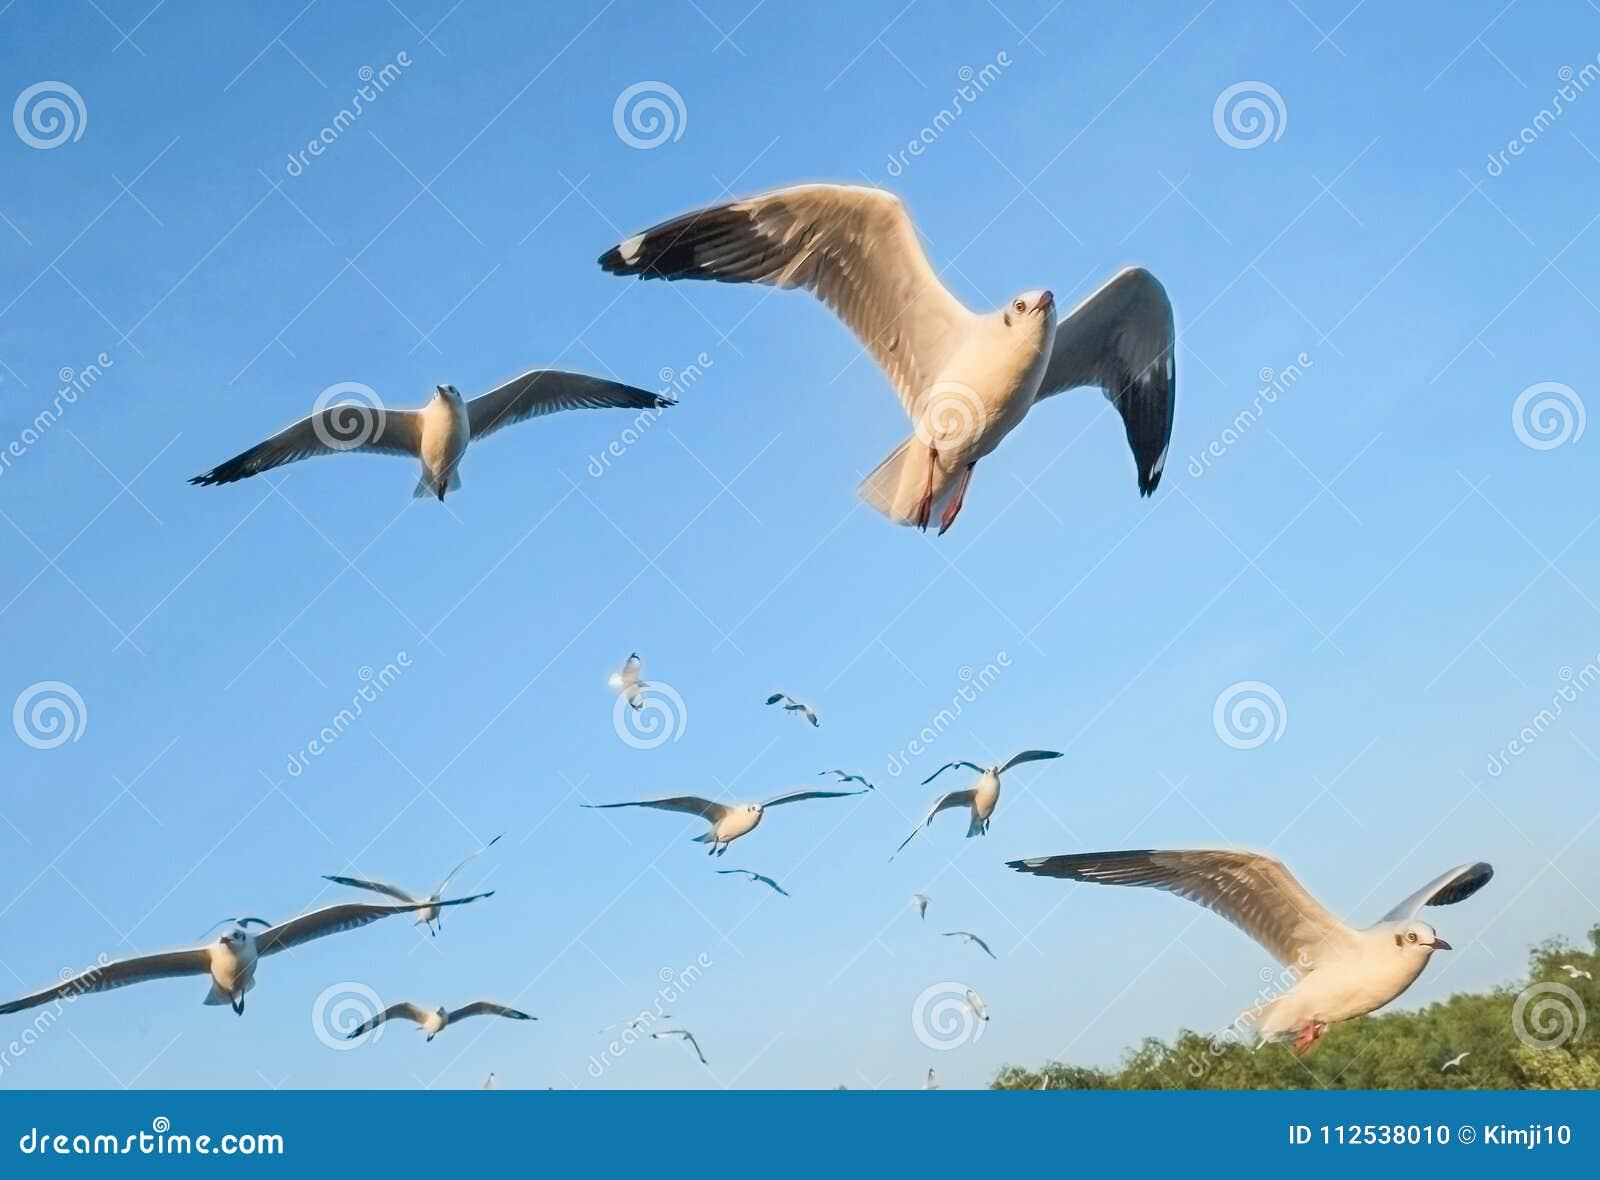 Seagulls μεταναστεύουν από τη Σιβηρία, τη Μογγολία, το Θιβέτ και την Κίνα για να κτυπήσουν το PU, Samut Prakan Ταϊλάνδη